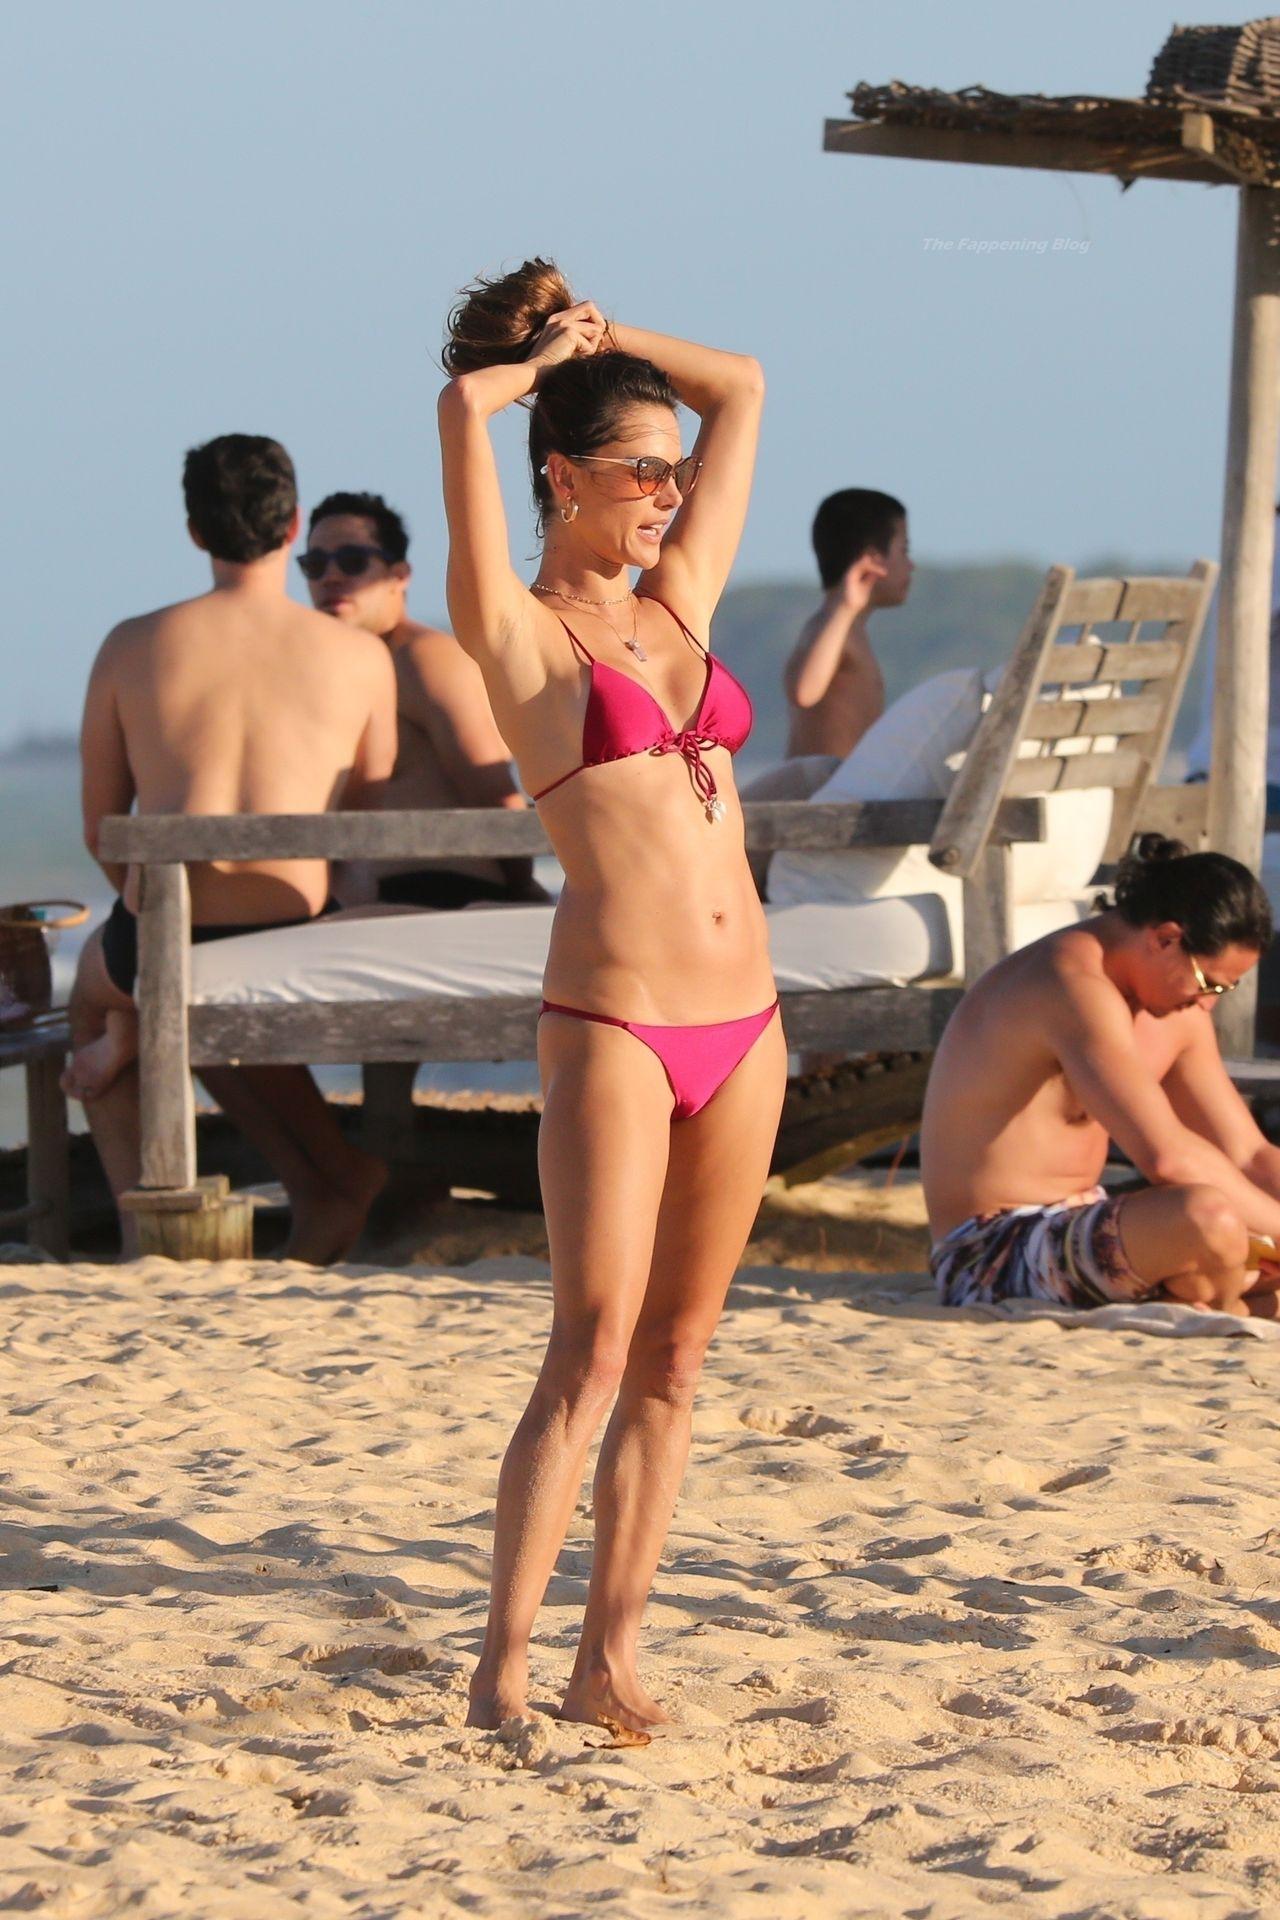 Alessandra-Ambrosio-Sexy-45-thefappeningblog.com_-1.jpg